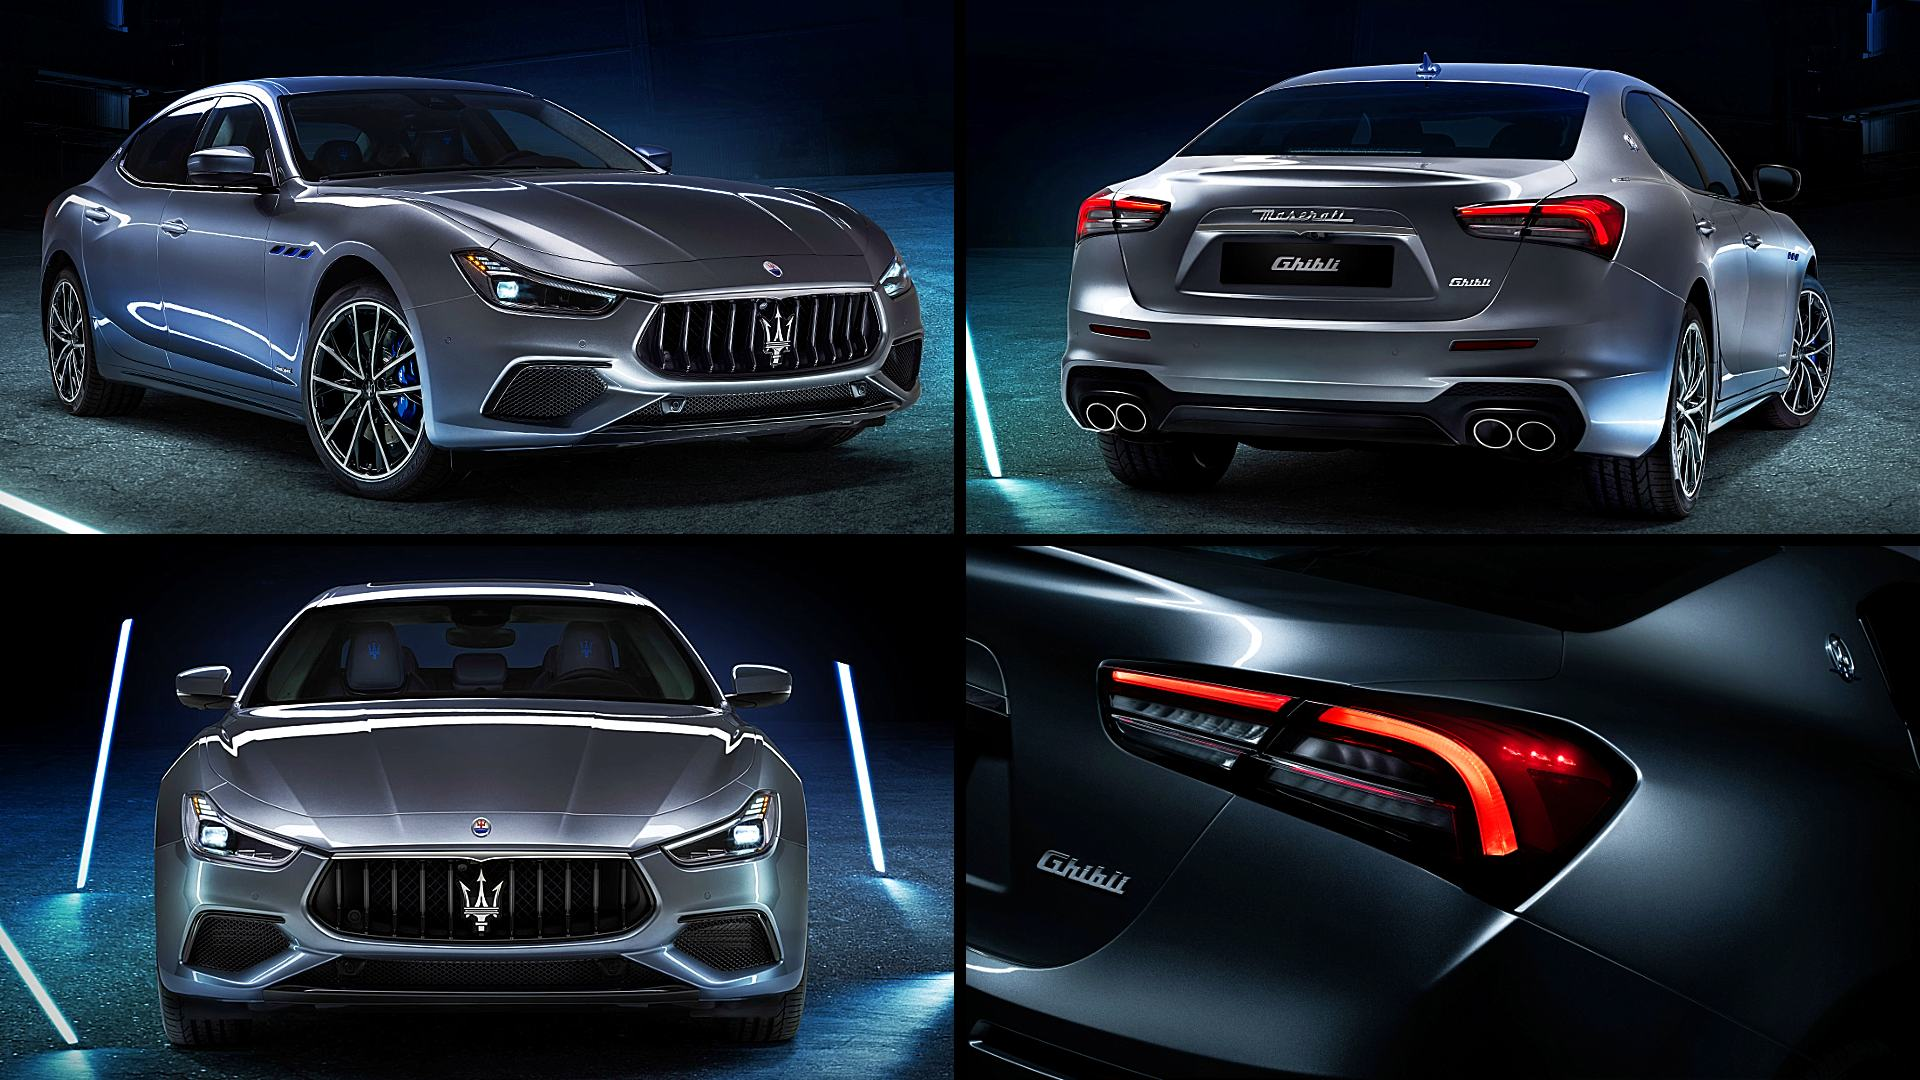 2021 Maserati Ghibli Sedan Hybrid